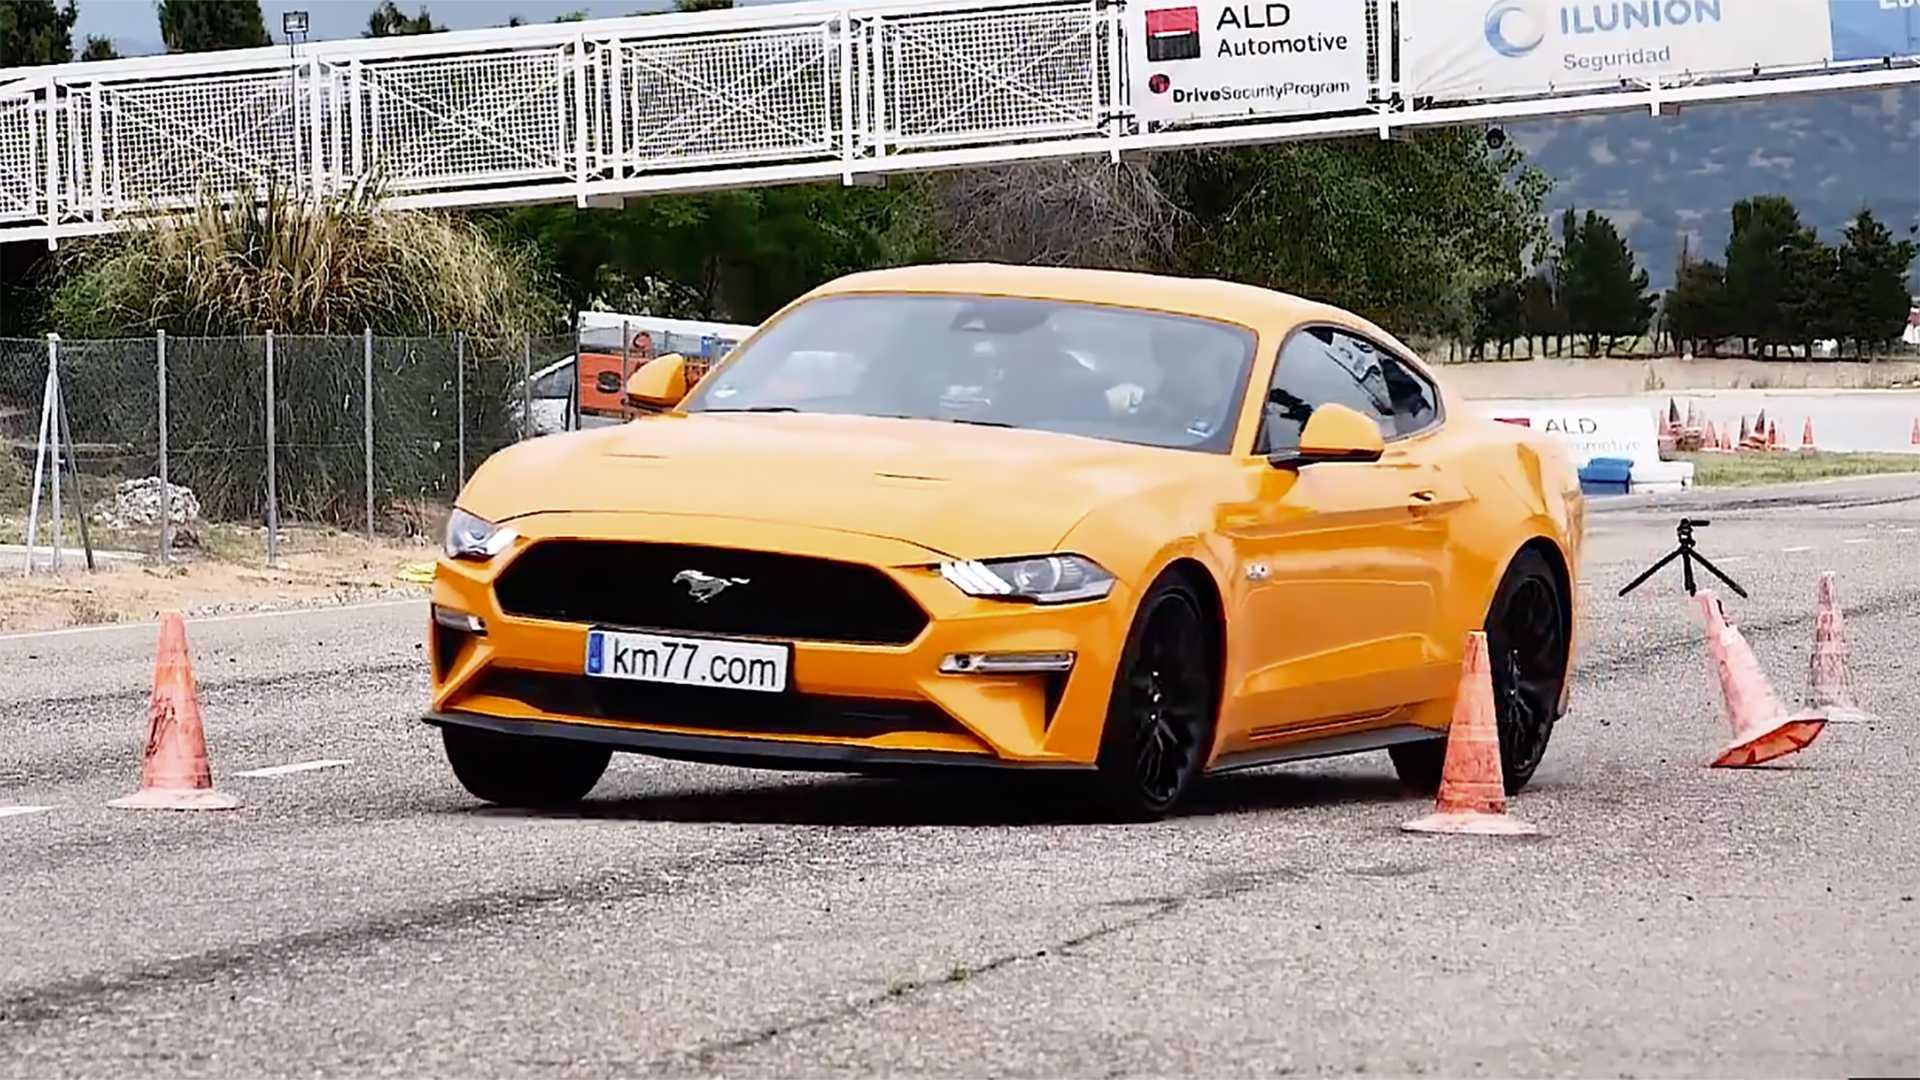 Ford Mustang GT juri 250 km/h nemačkim autobanom! (VIDEO)